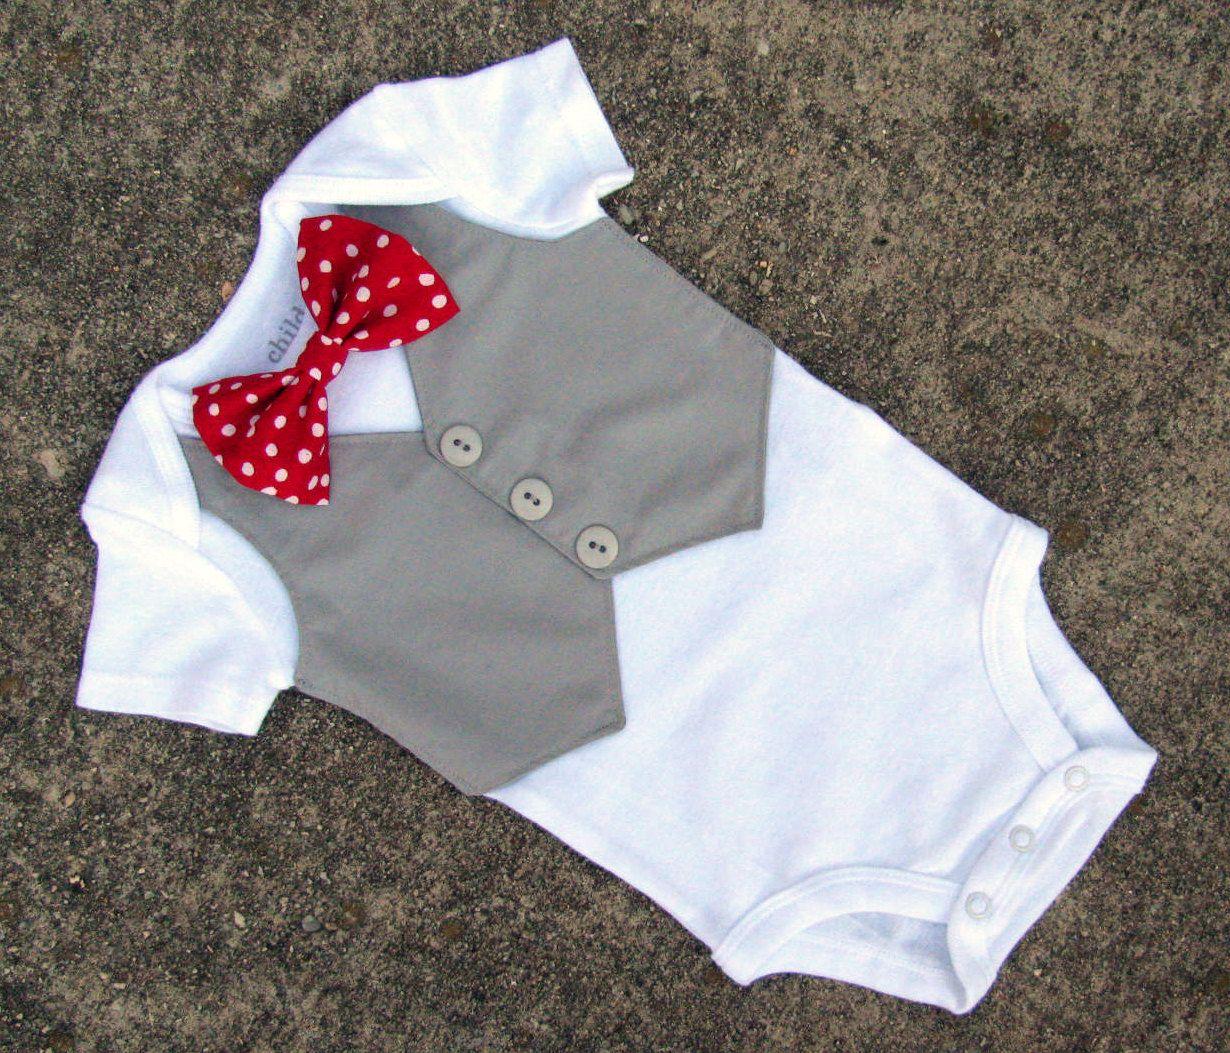 baby boy valentines day shirt custom tuxedo onesie or tshirt polka dot red bow tie - Valentines Day Outfit Baby Boy